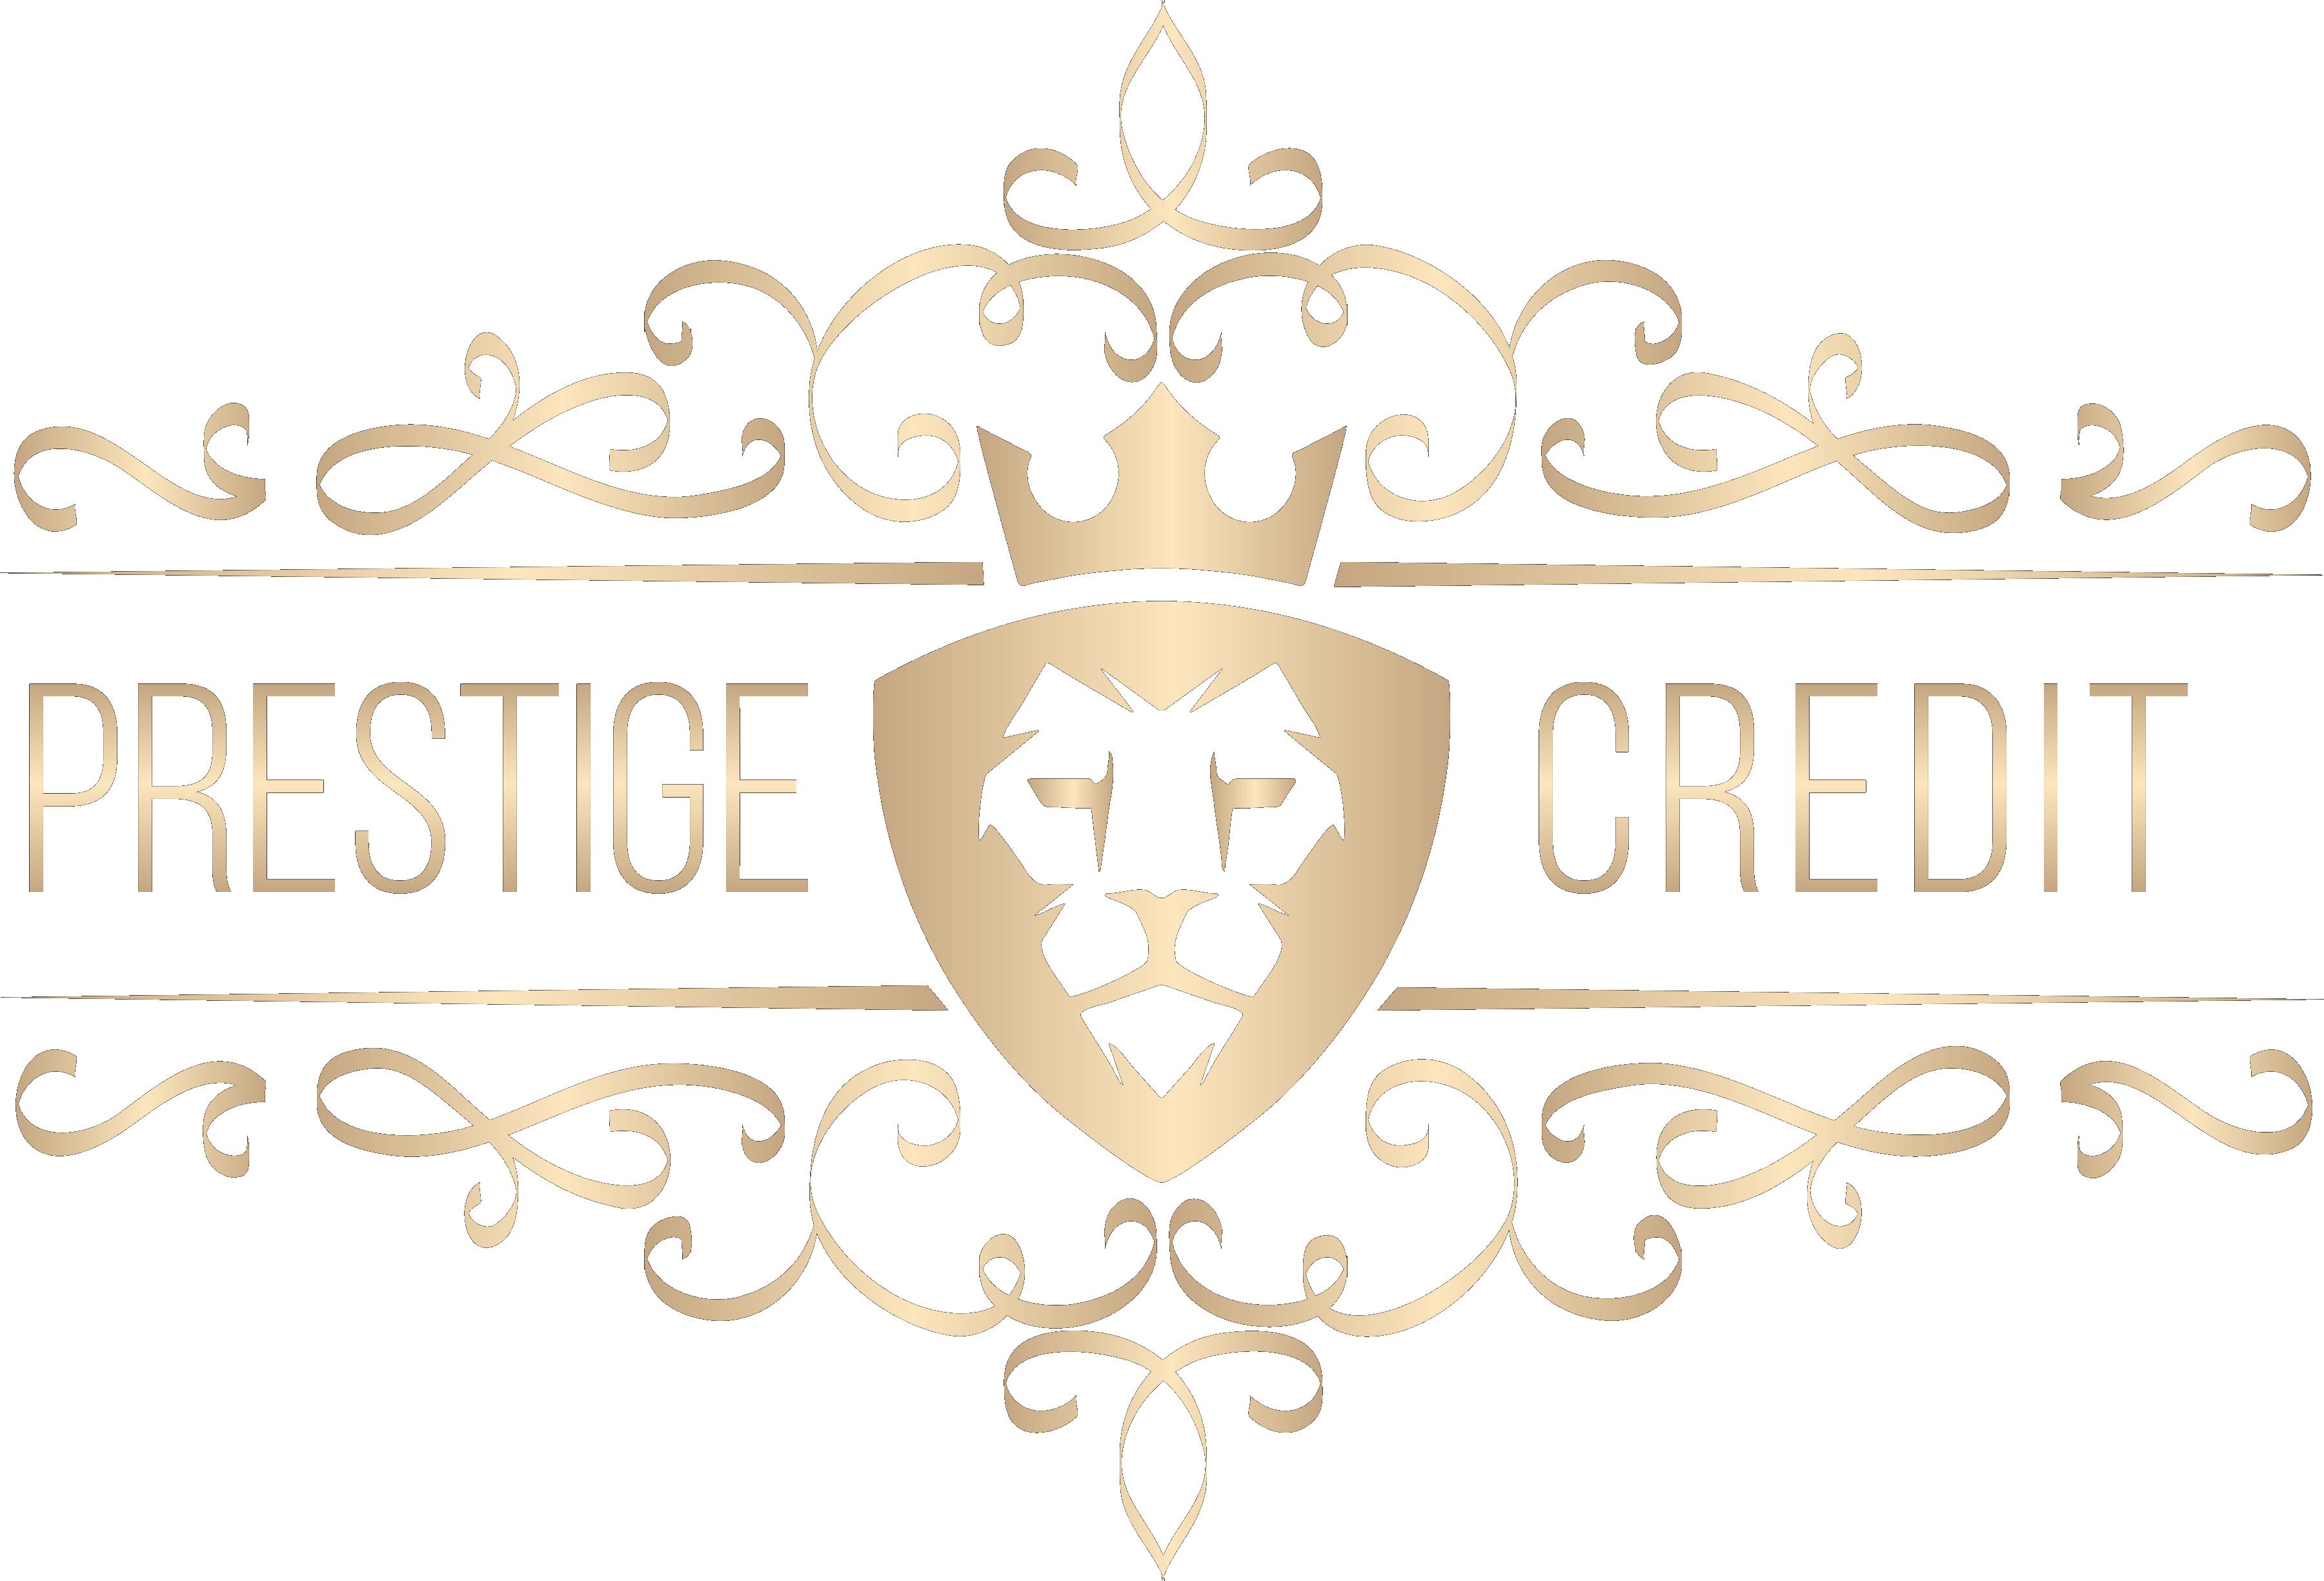 Prestige Credit